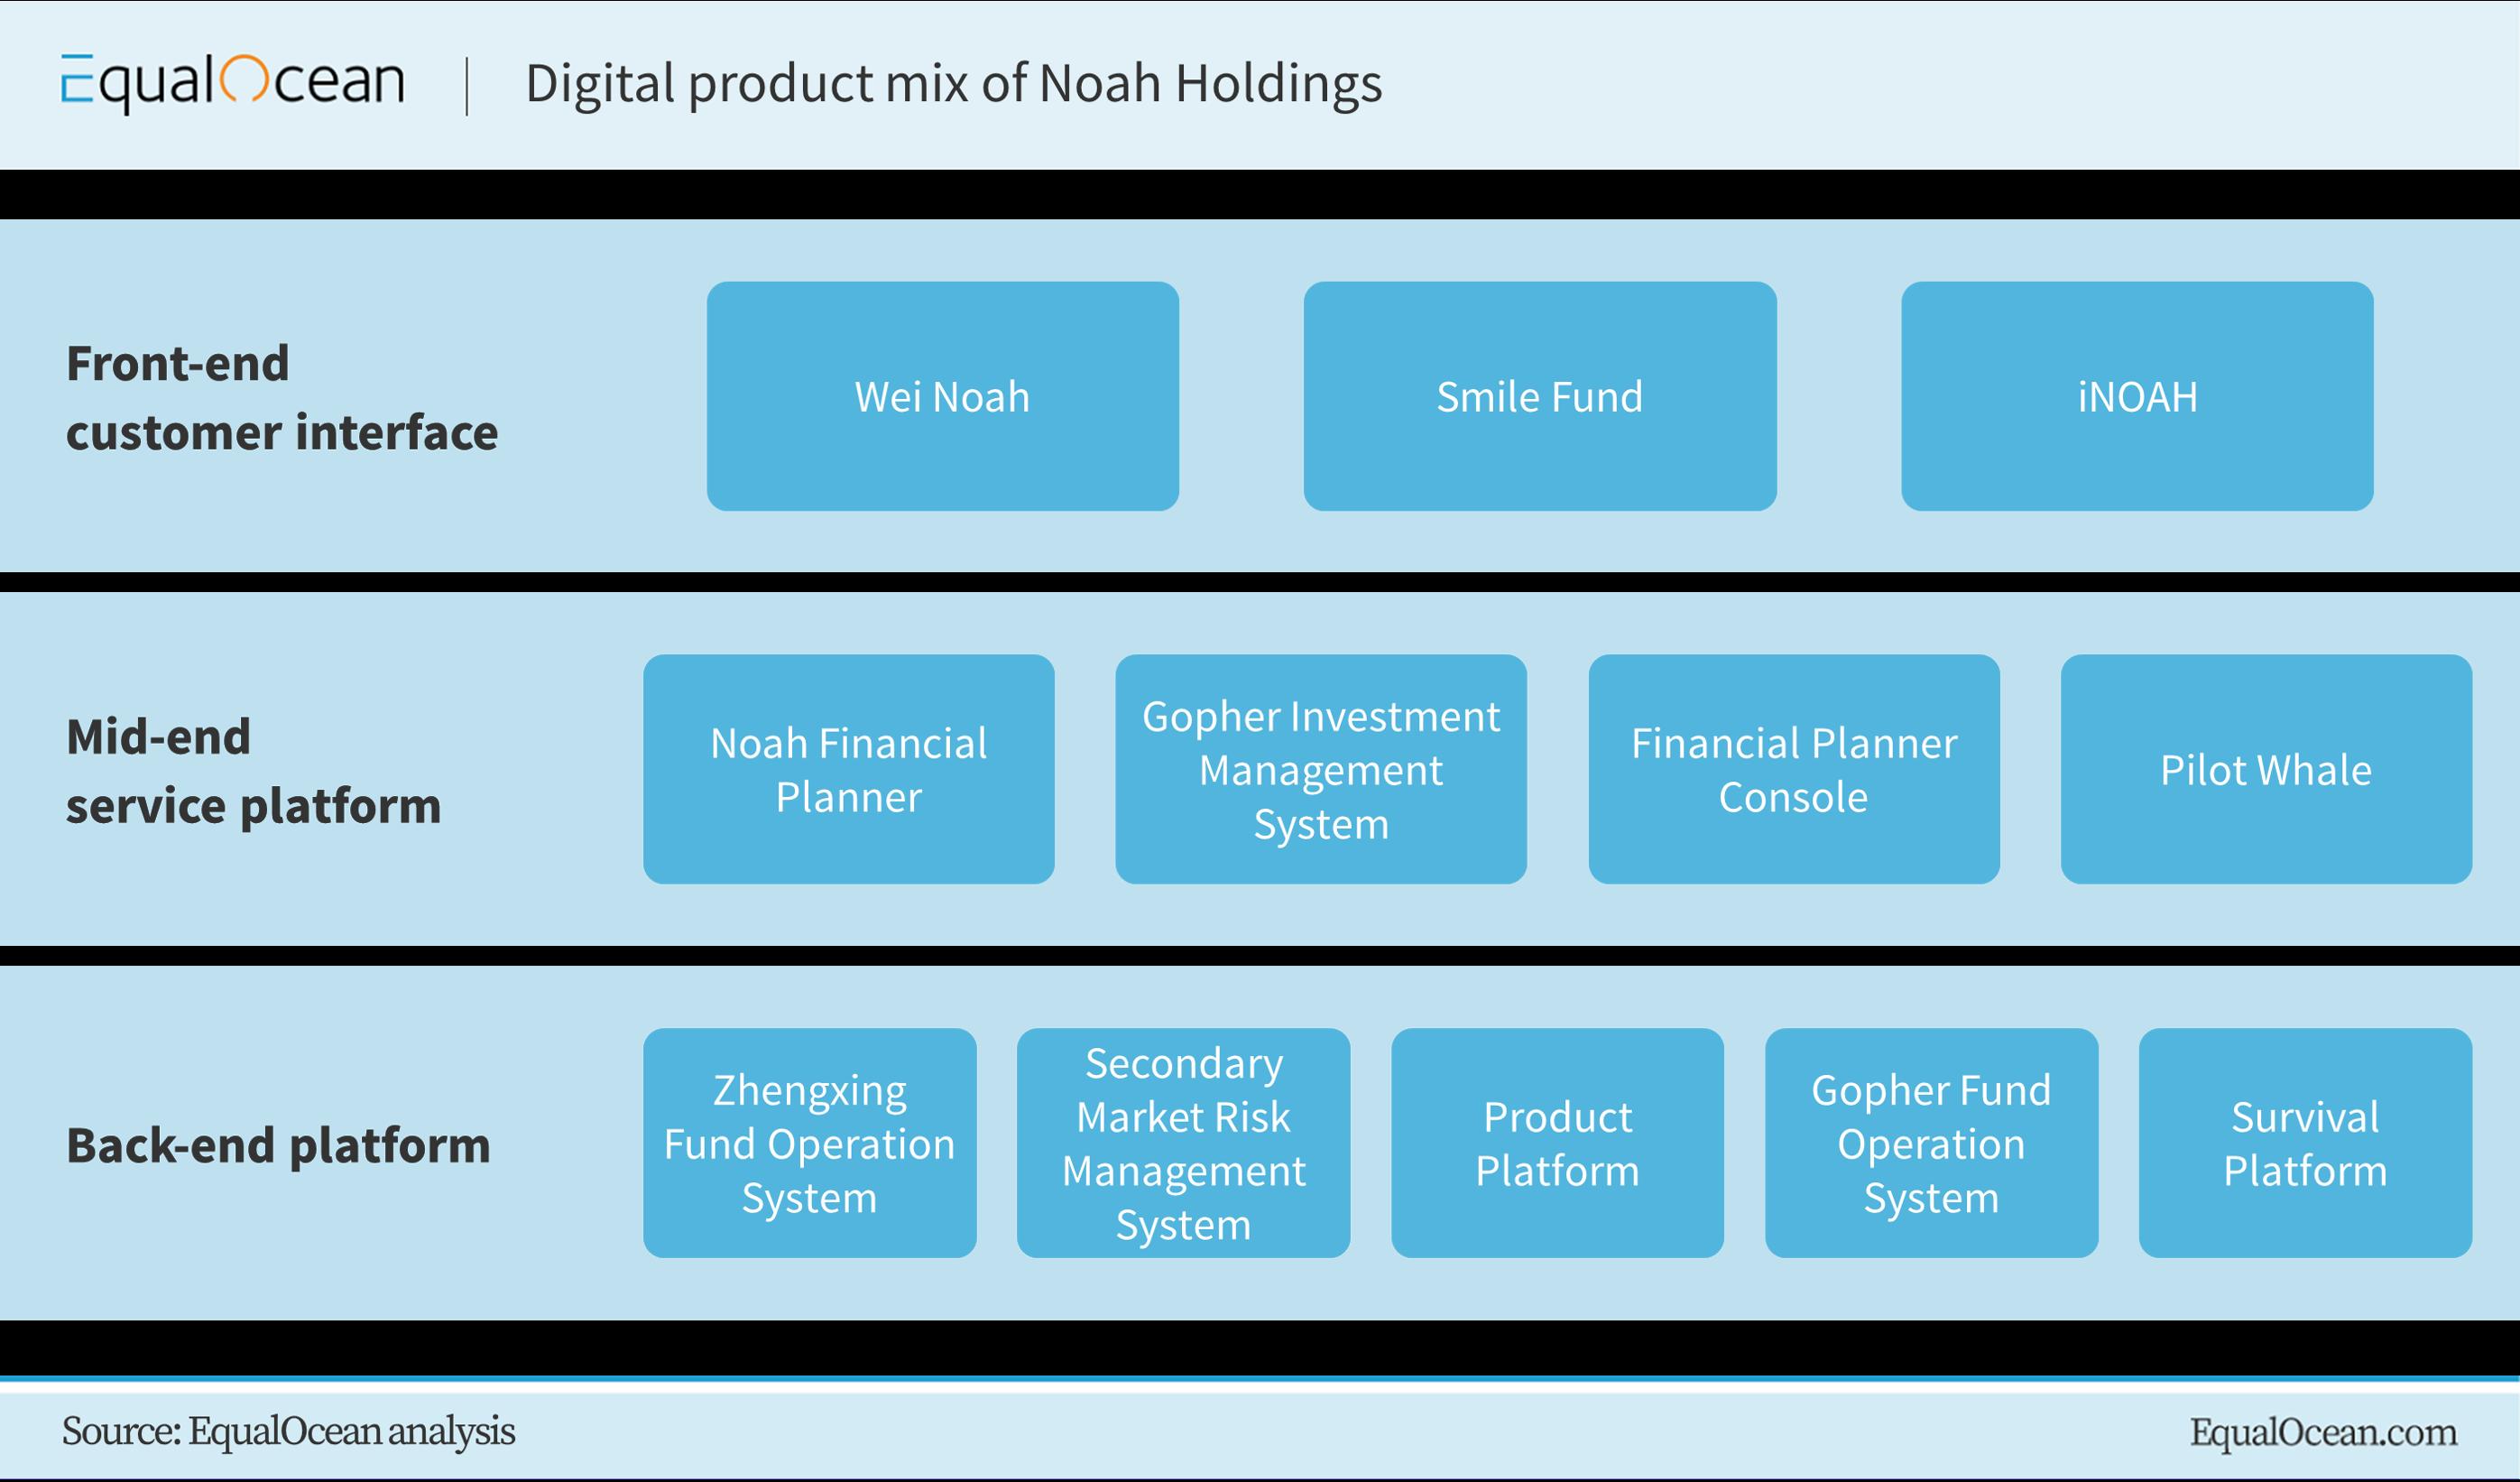 Digital product mix of Noah Holdings